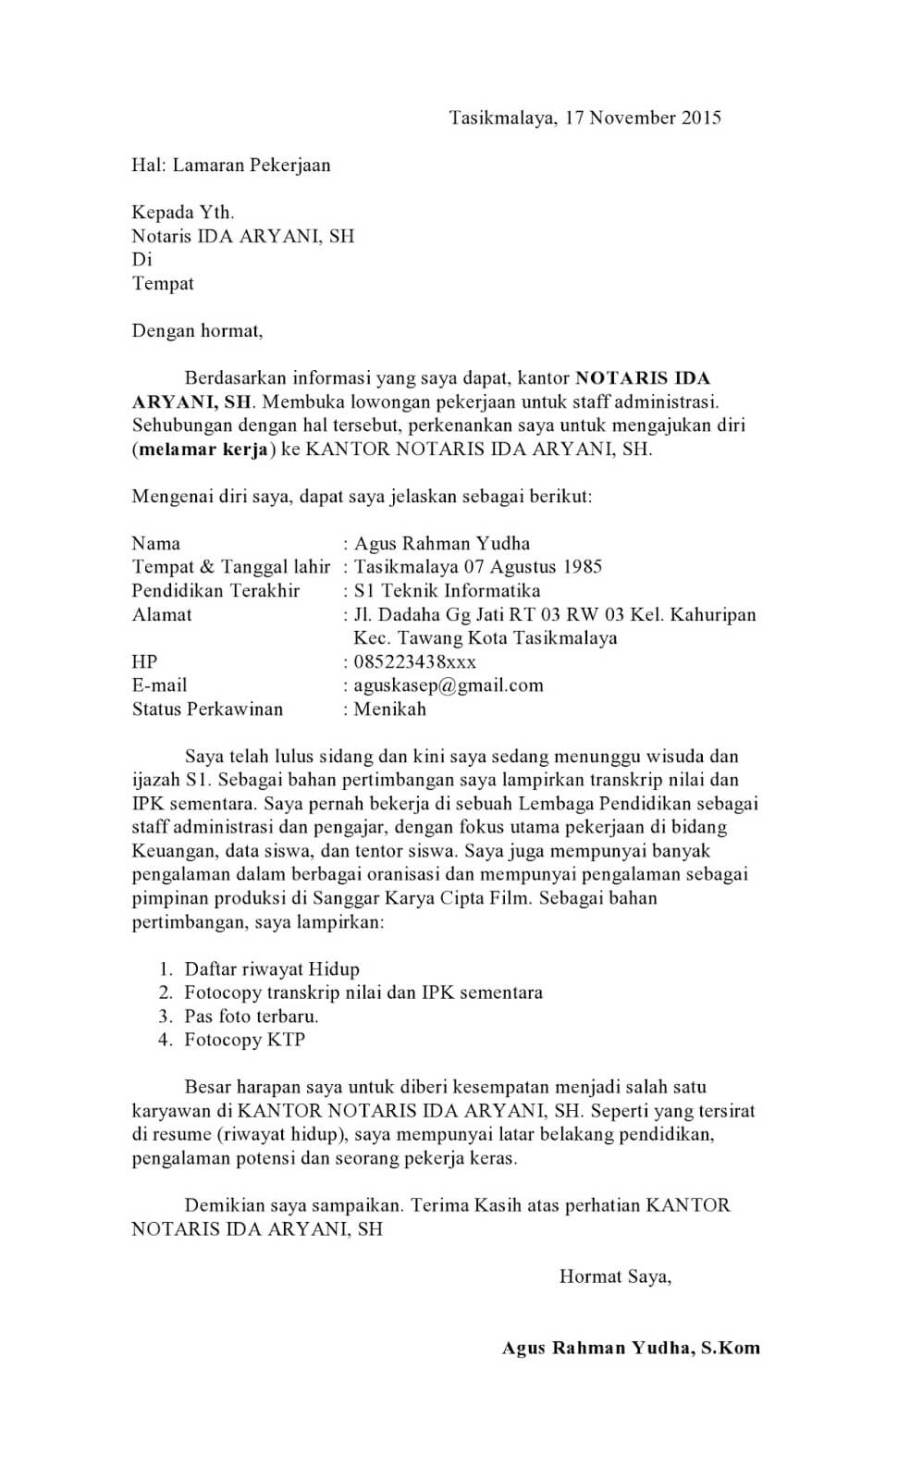 Contoh Surat Lamaran Kerja Administrasi Yang Baik Dan Benar